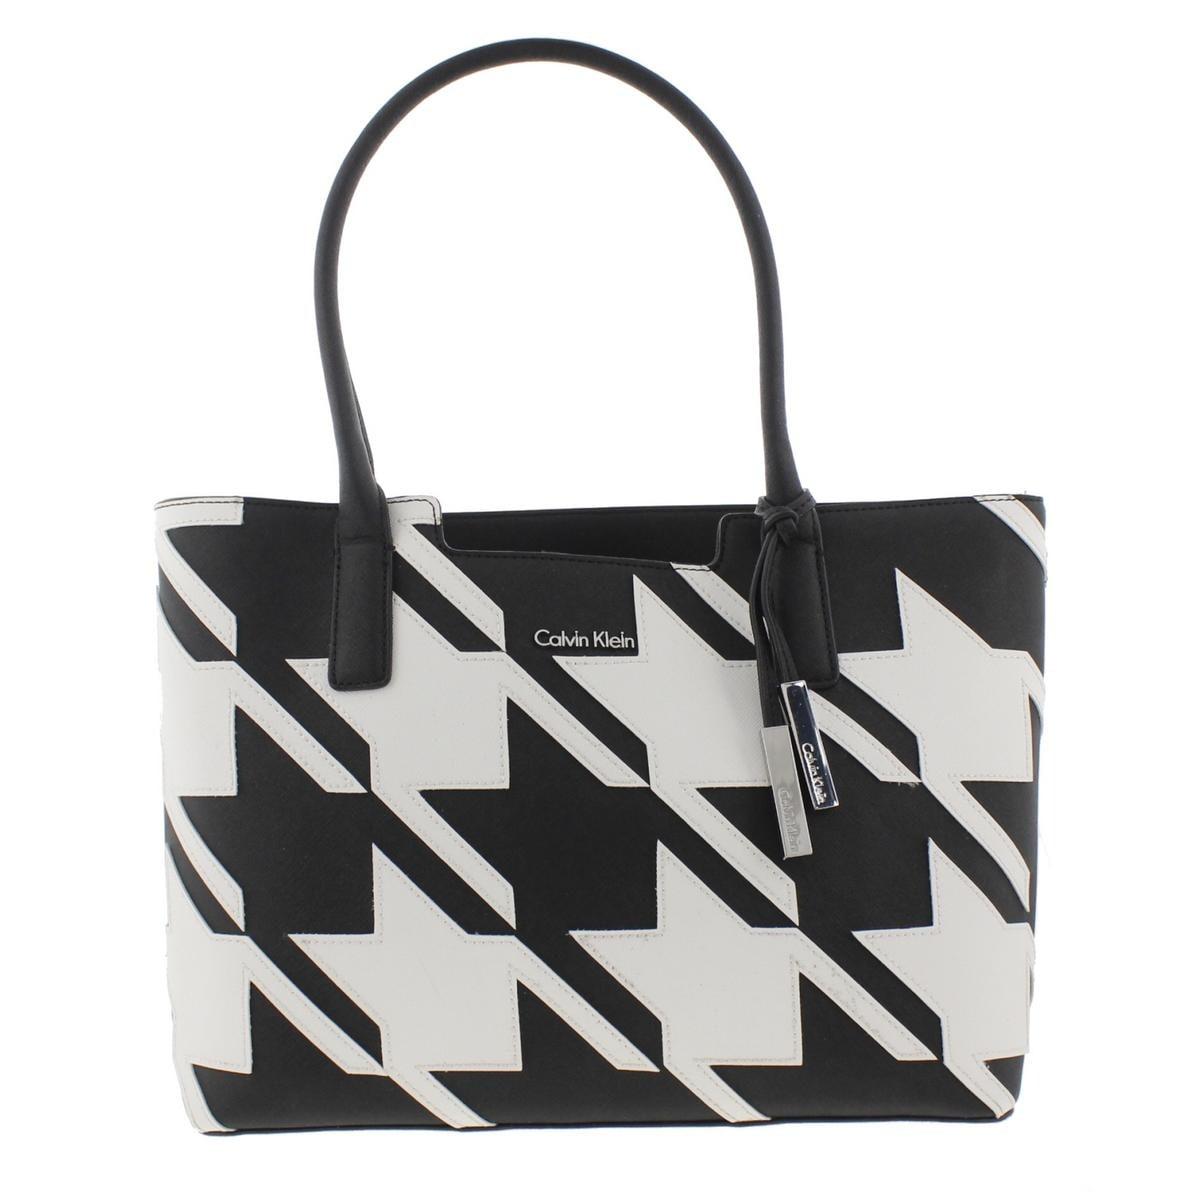 Calvin Klein Womens Tote Handbag Saffiano Leather Houndstooth ...